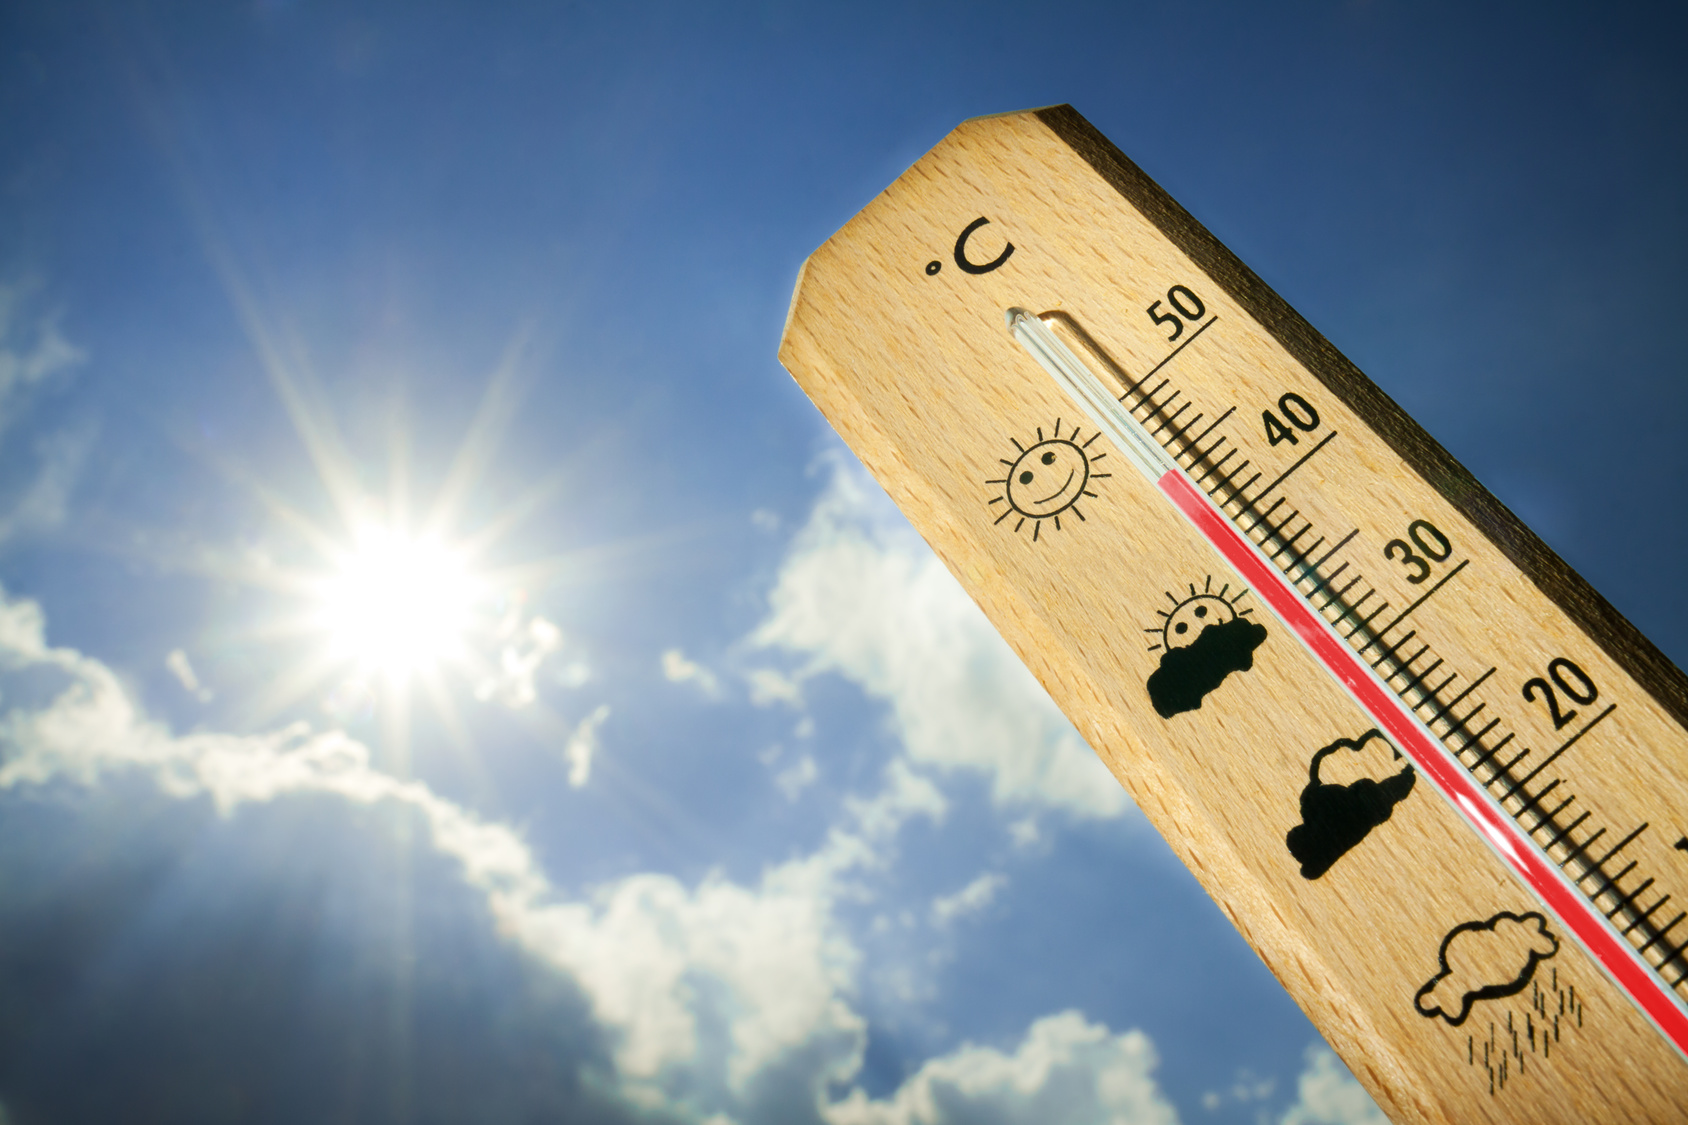 Meteo: in arrivo il caldo